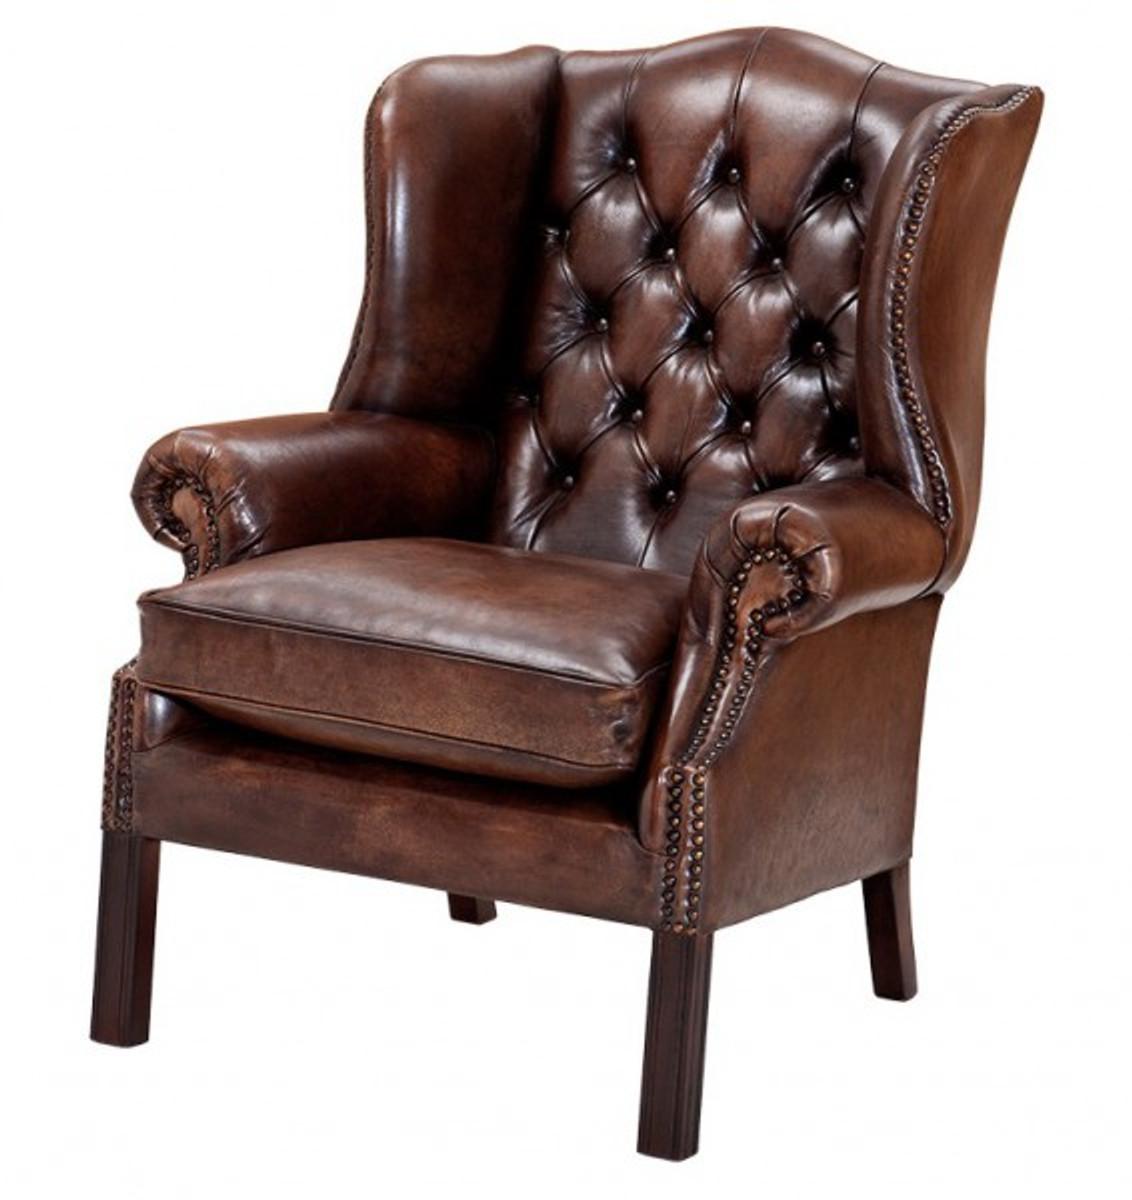 Luxus echtleder ohrensessel chesterfield vintage for Ohrensessel union jack